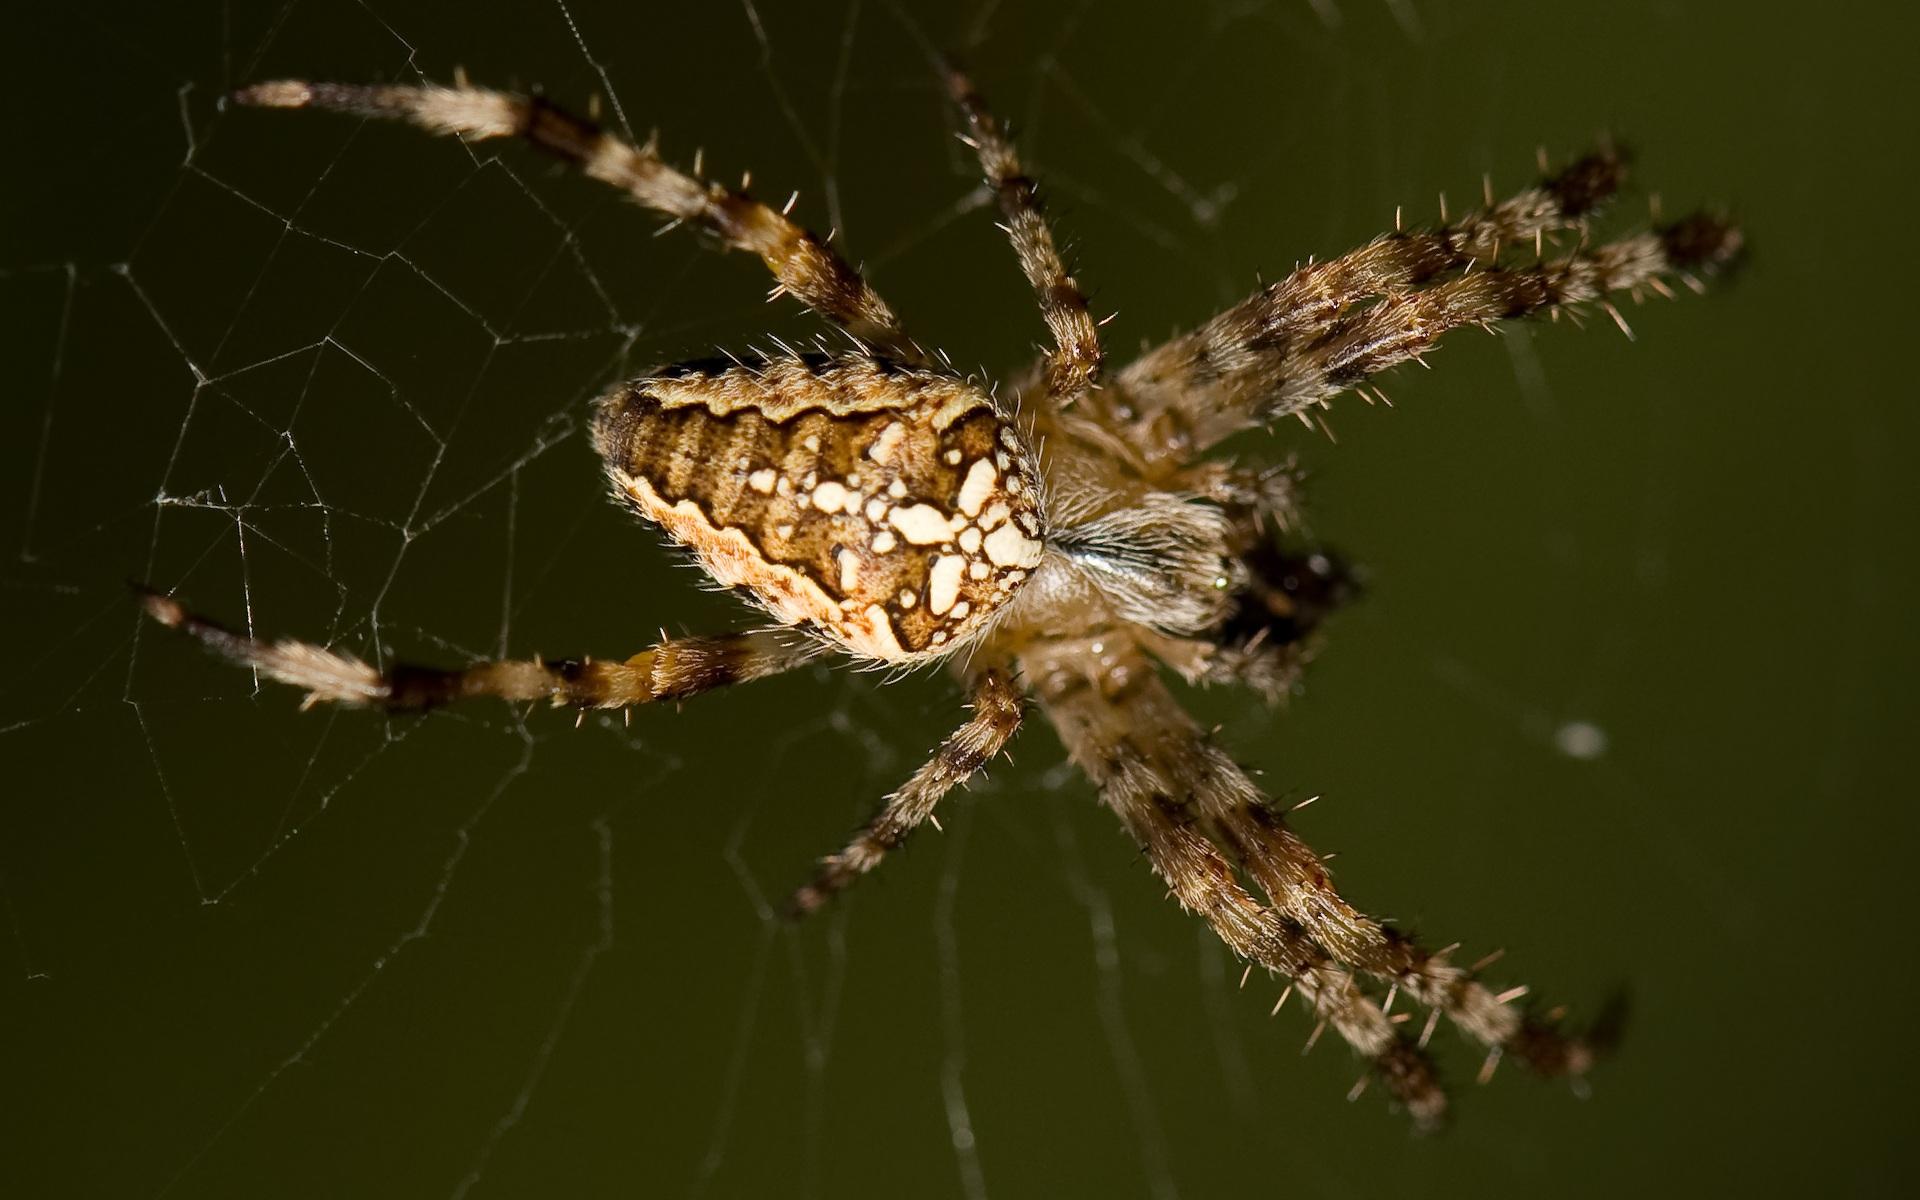 Spider pictures hd hd desktop wallpapers 4k hd - Moving spider desktop ...